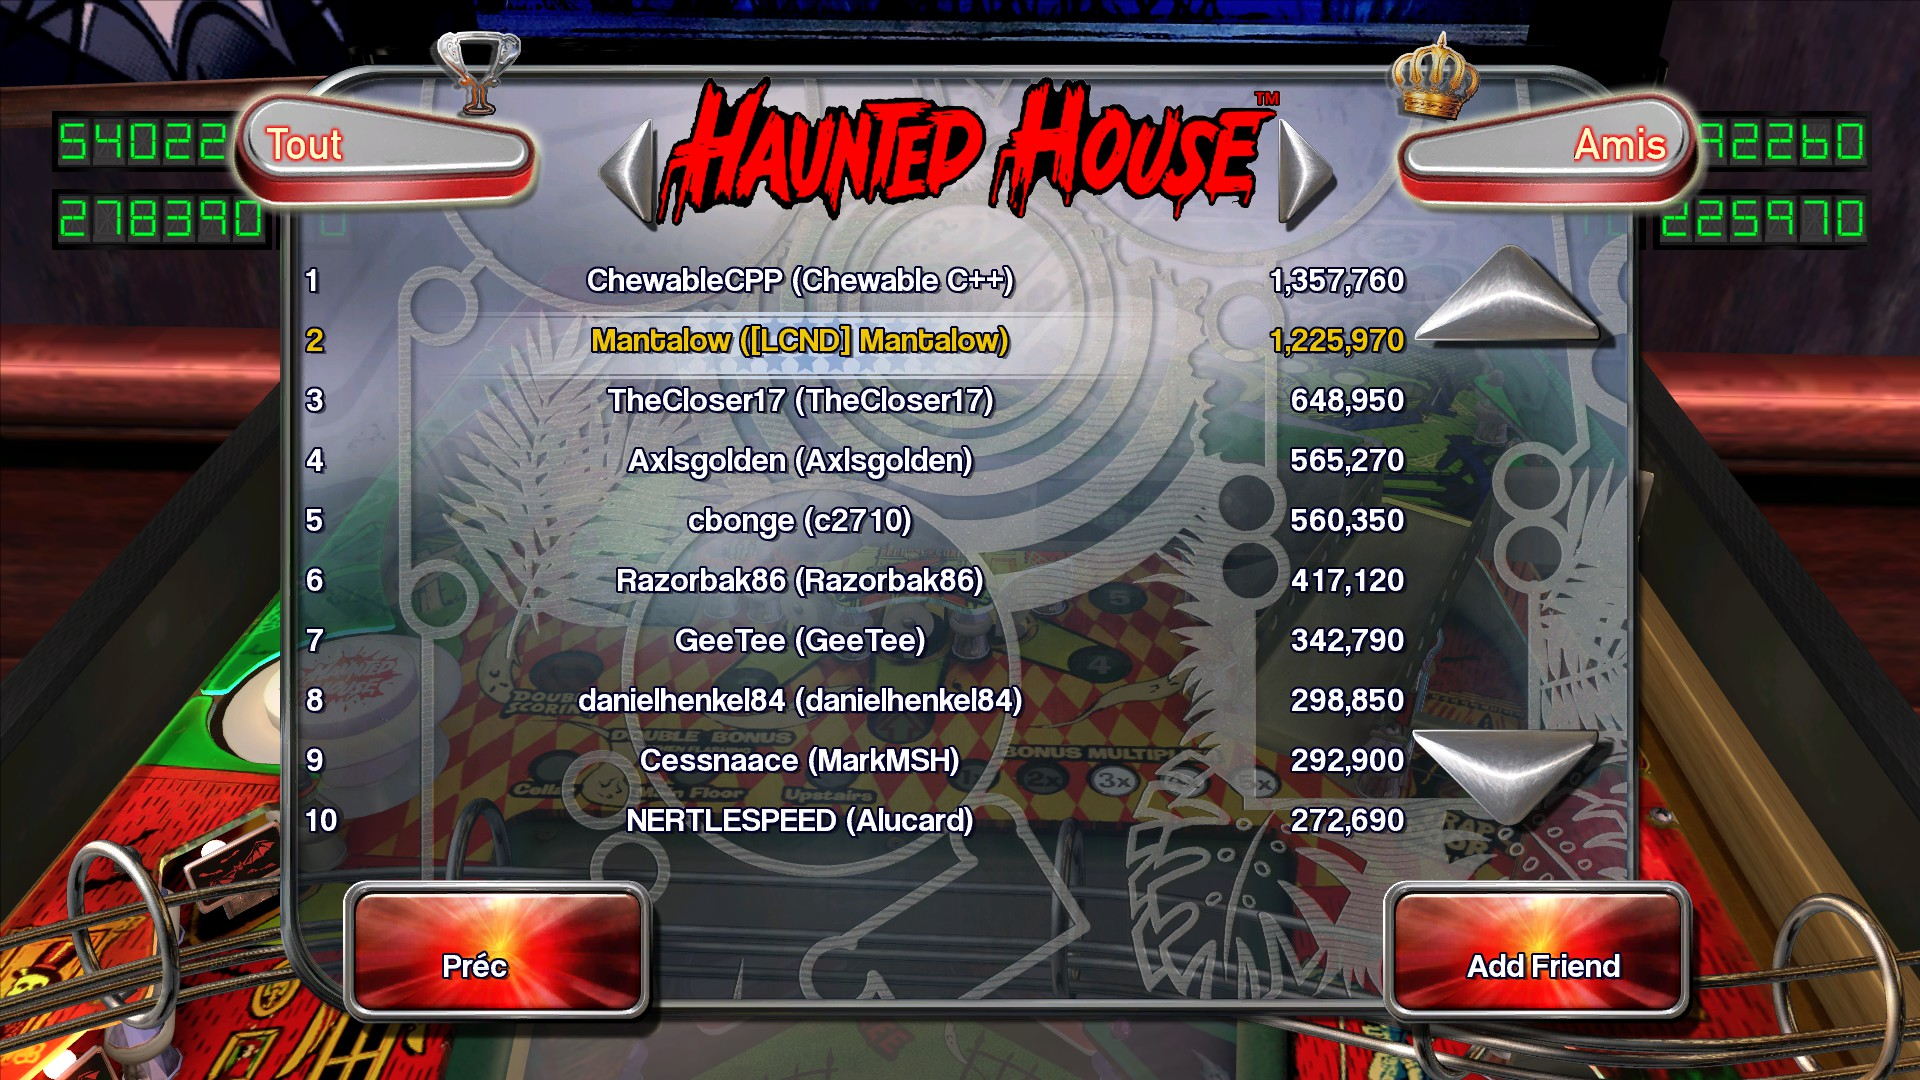 Mantalow: Pinball Arcade: Haunted House (PC) 1,225,970 points on 2015-07-01 15:35:06